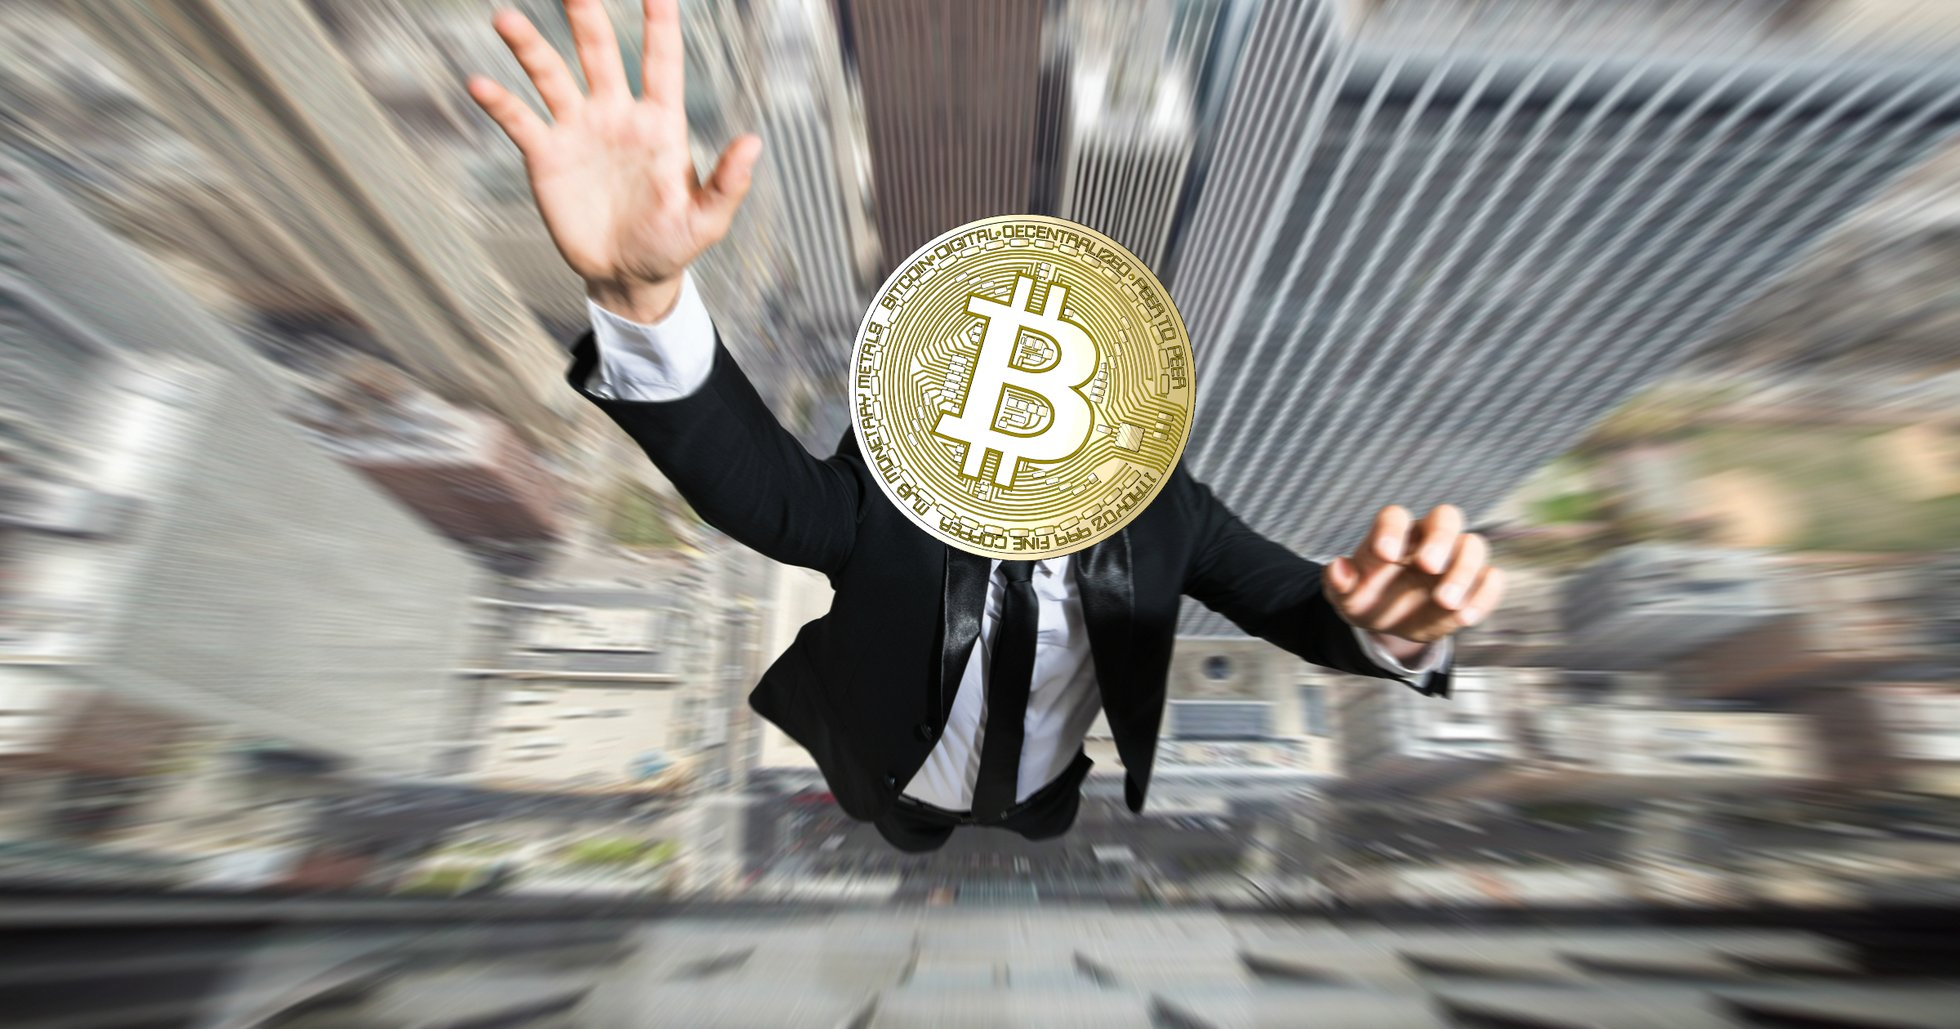 Bitcoinpriset tappar 5 procent på två dygn: